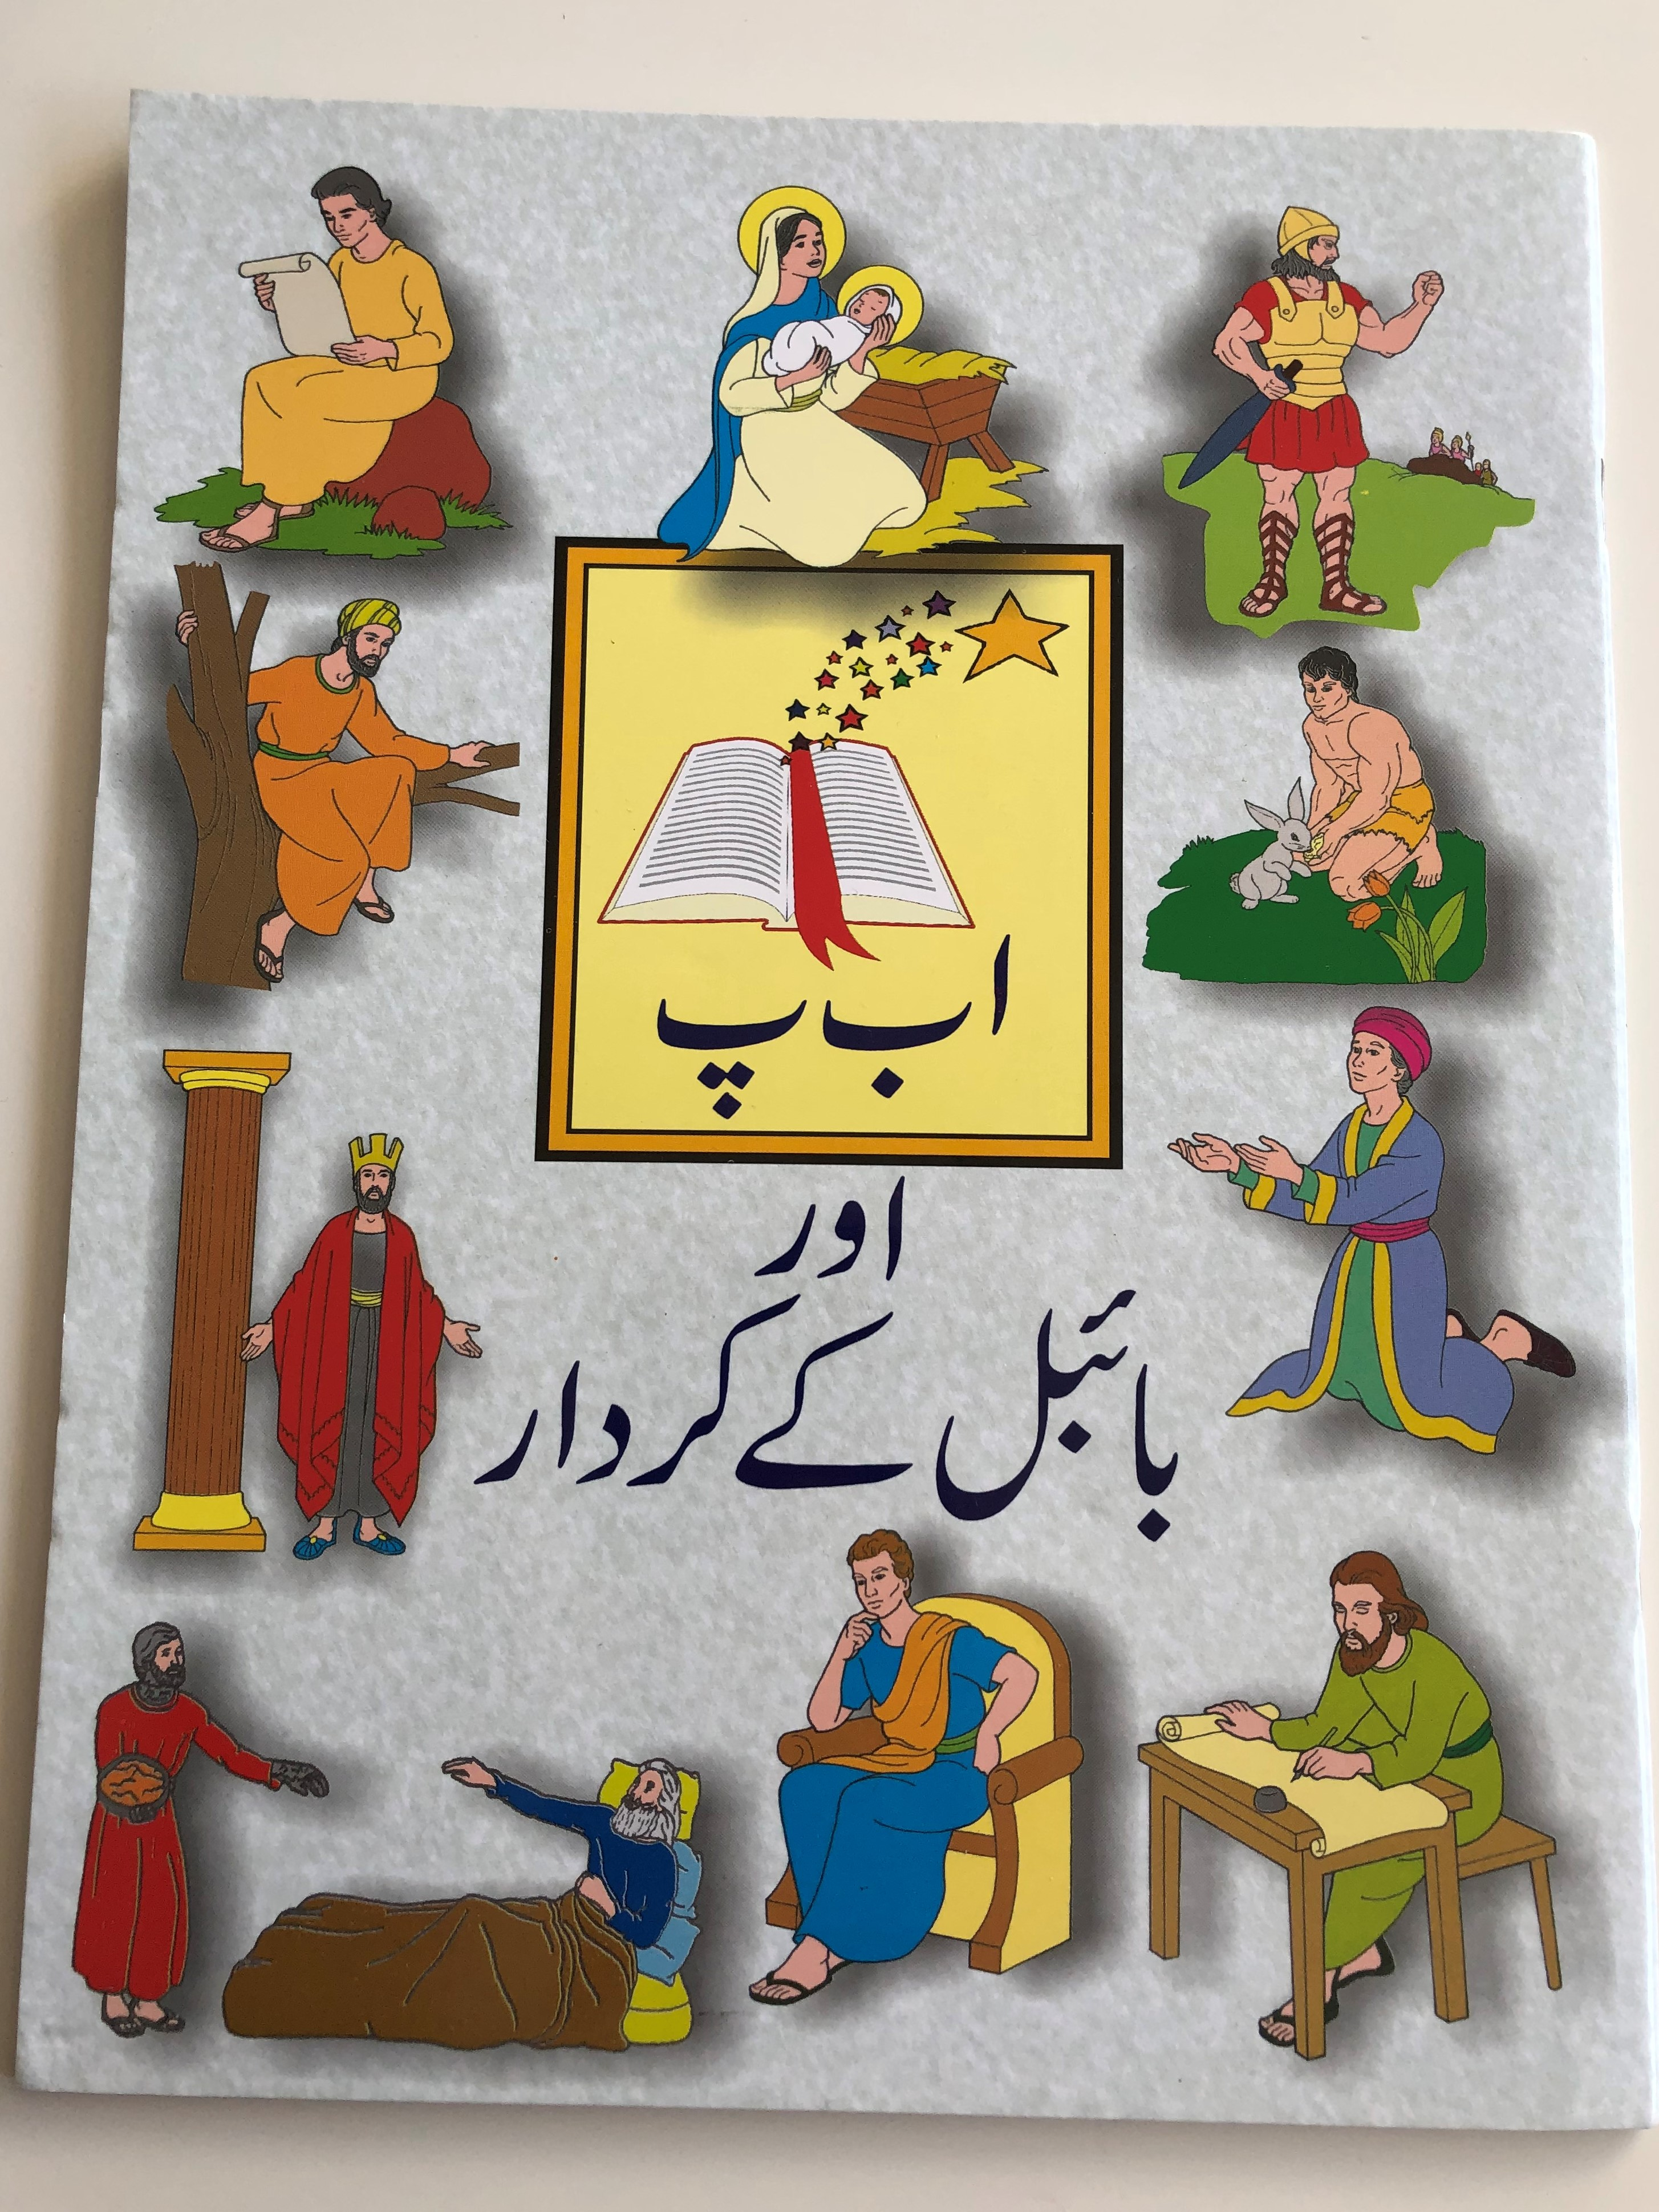 abc-of-the-bible-urdu-language-children-s-coloring-book-paperback-1.jpg